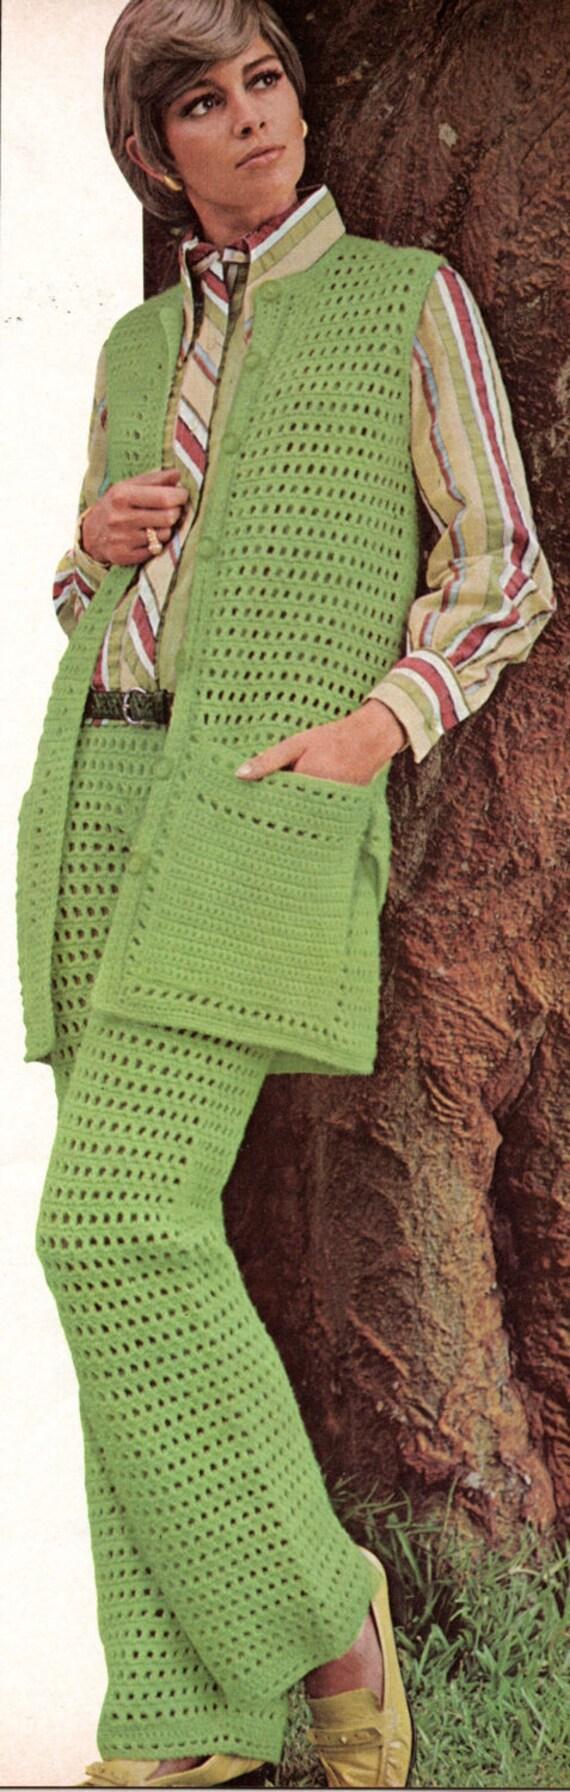 1960s Eyelet Pants Suit Crochet Pattern Womens Two Piece Pants